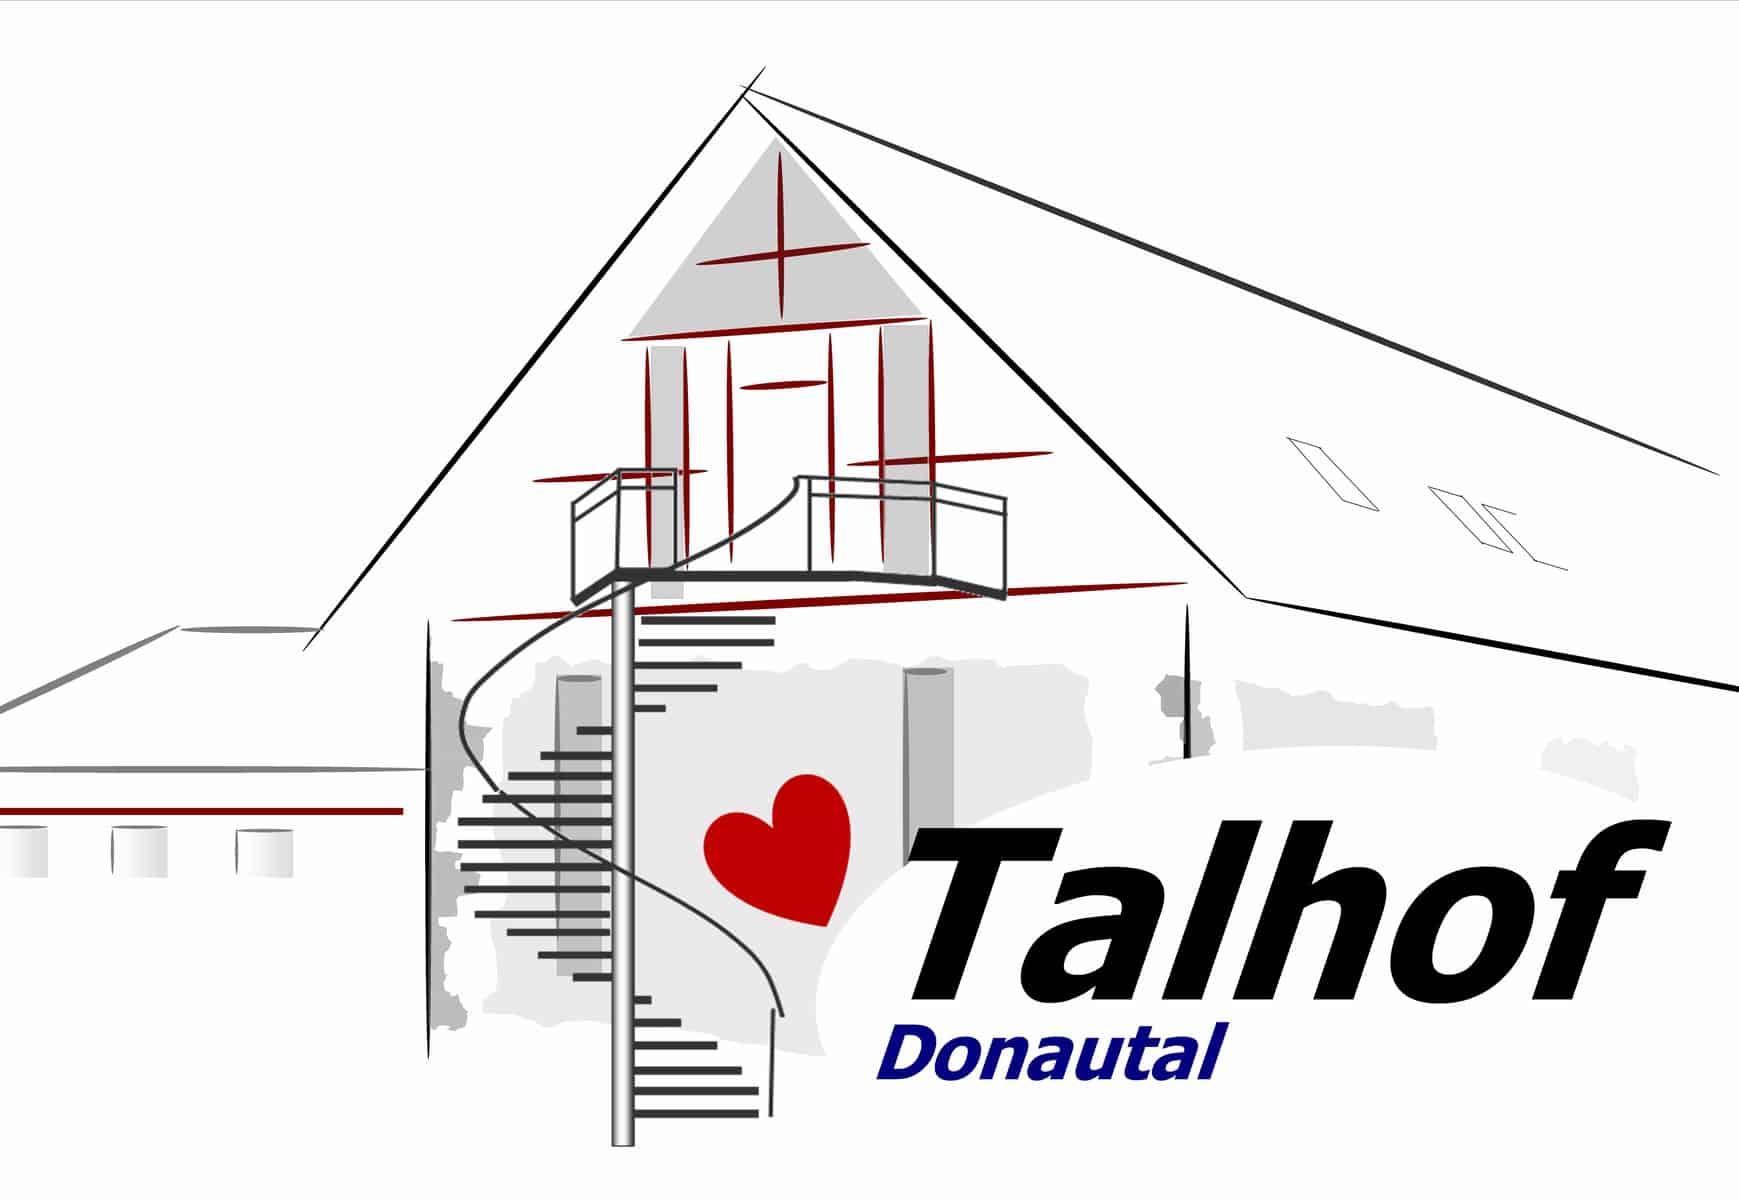 Talhof Donautal